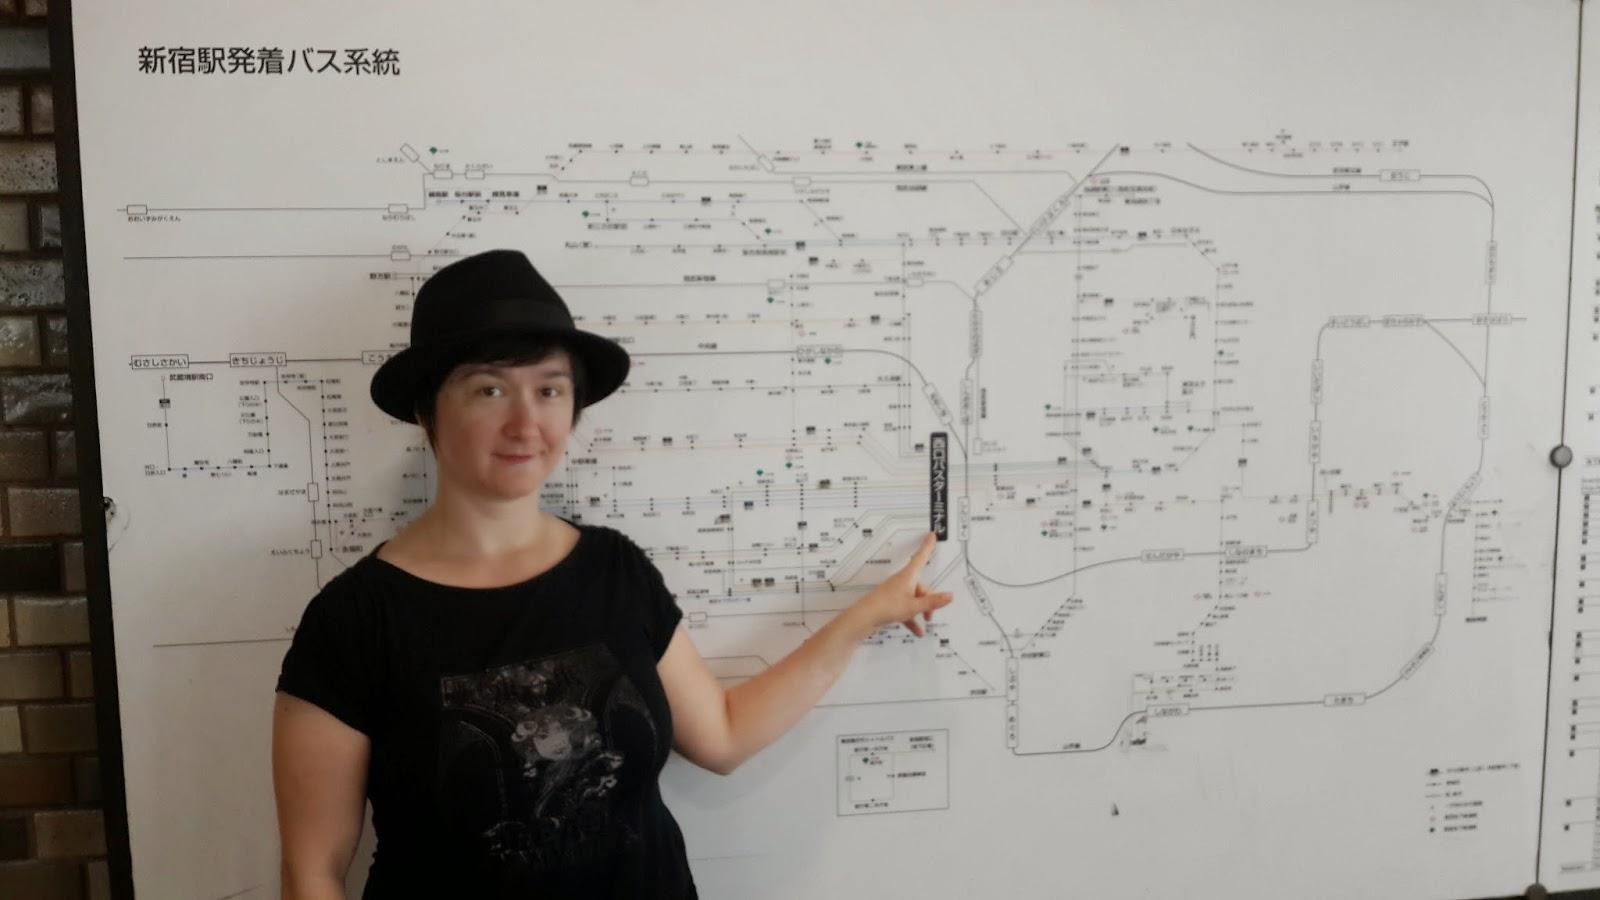 A map of Shinjuku station